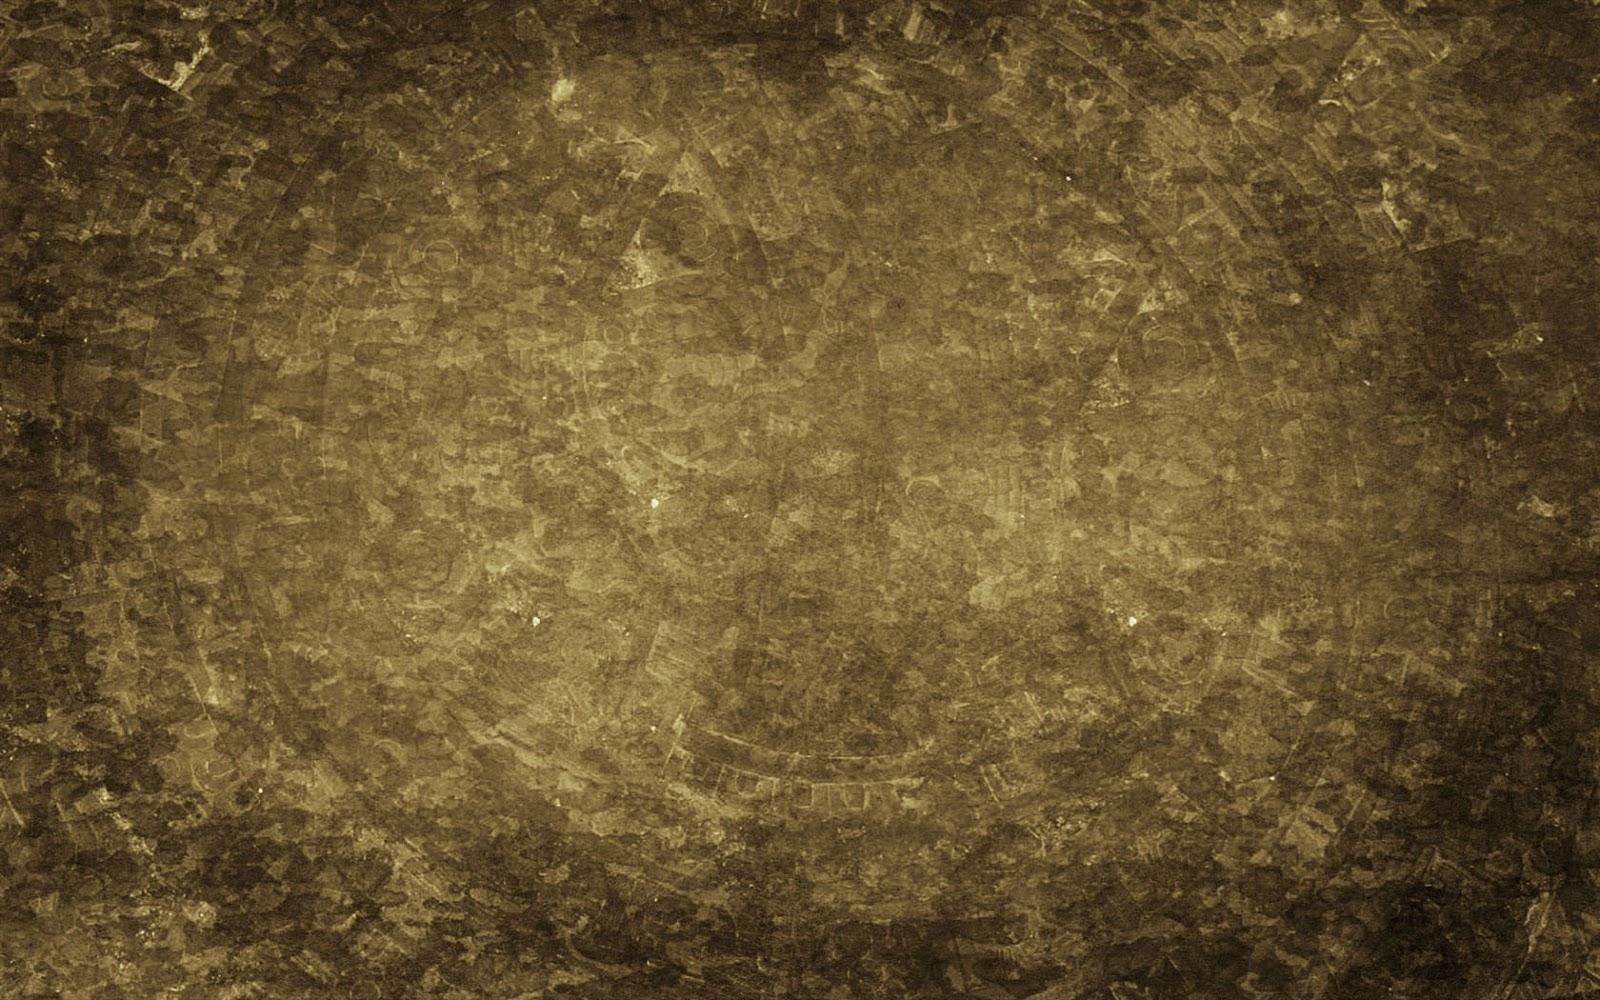 10 Renaissance Tumblr Backgrounds ibjennyjenny 1600x1000